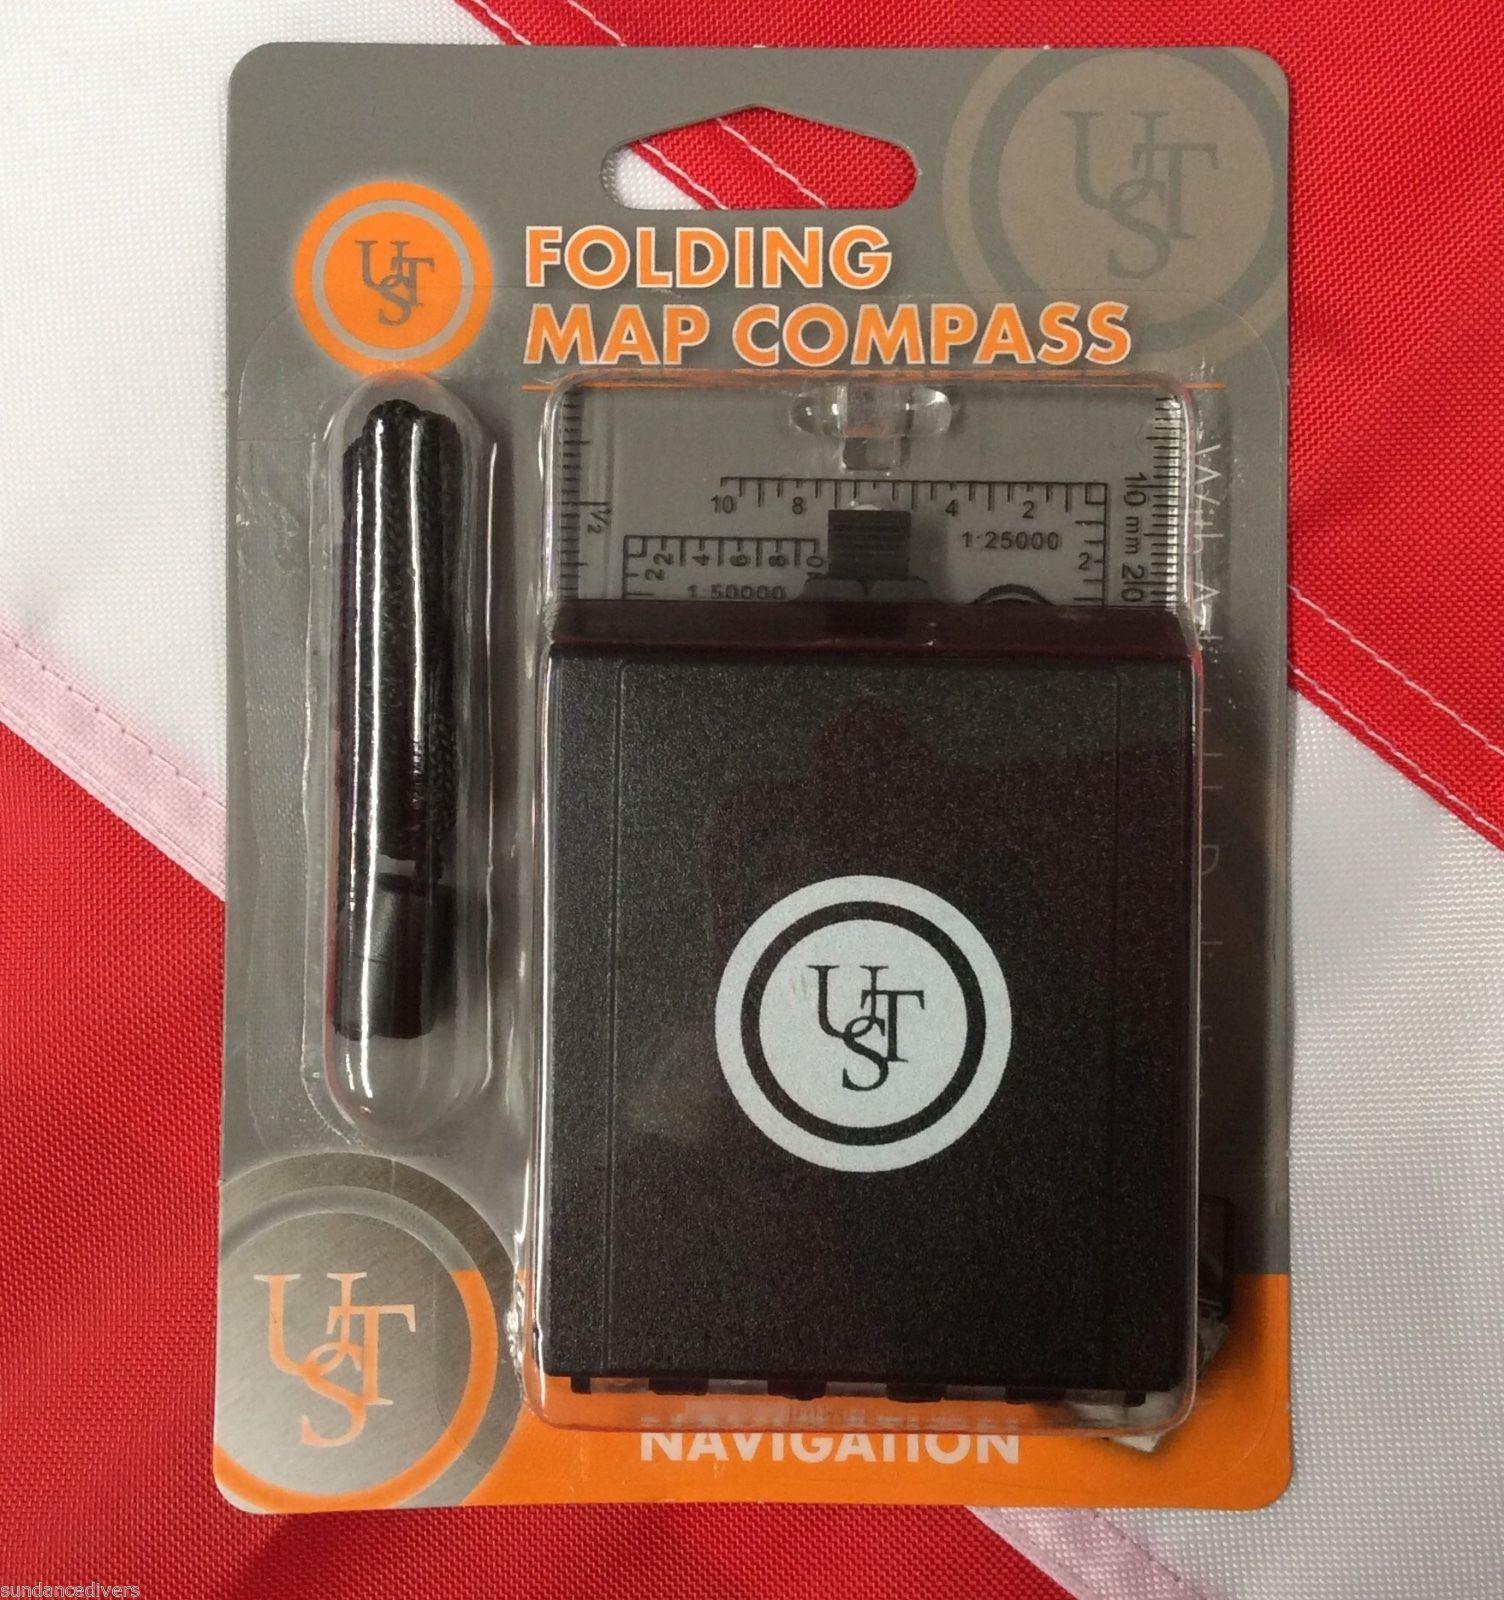 UST Folding Map Compass Black